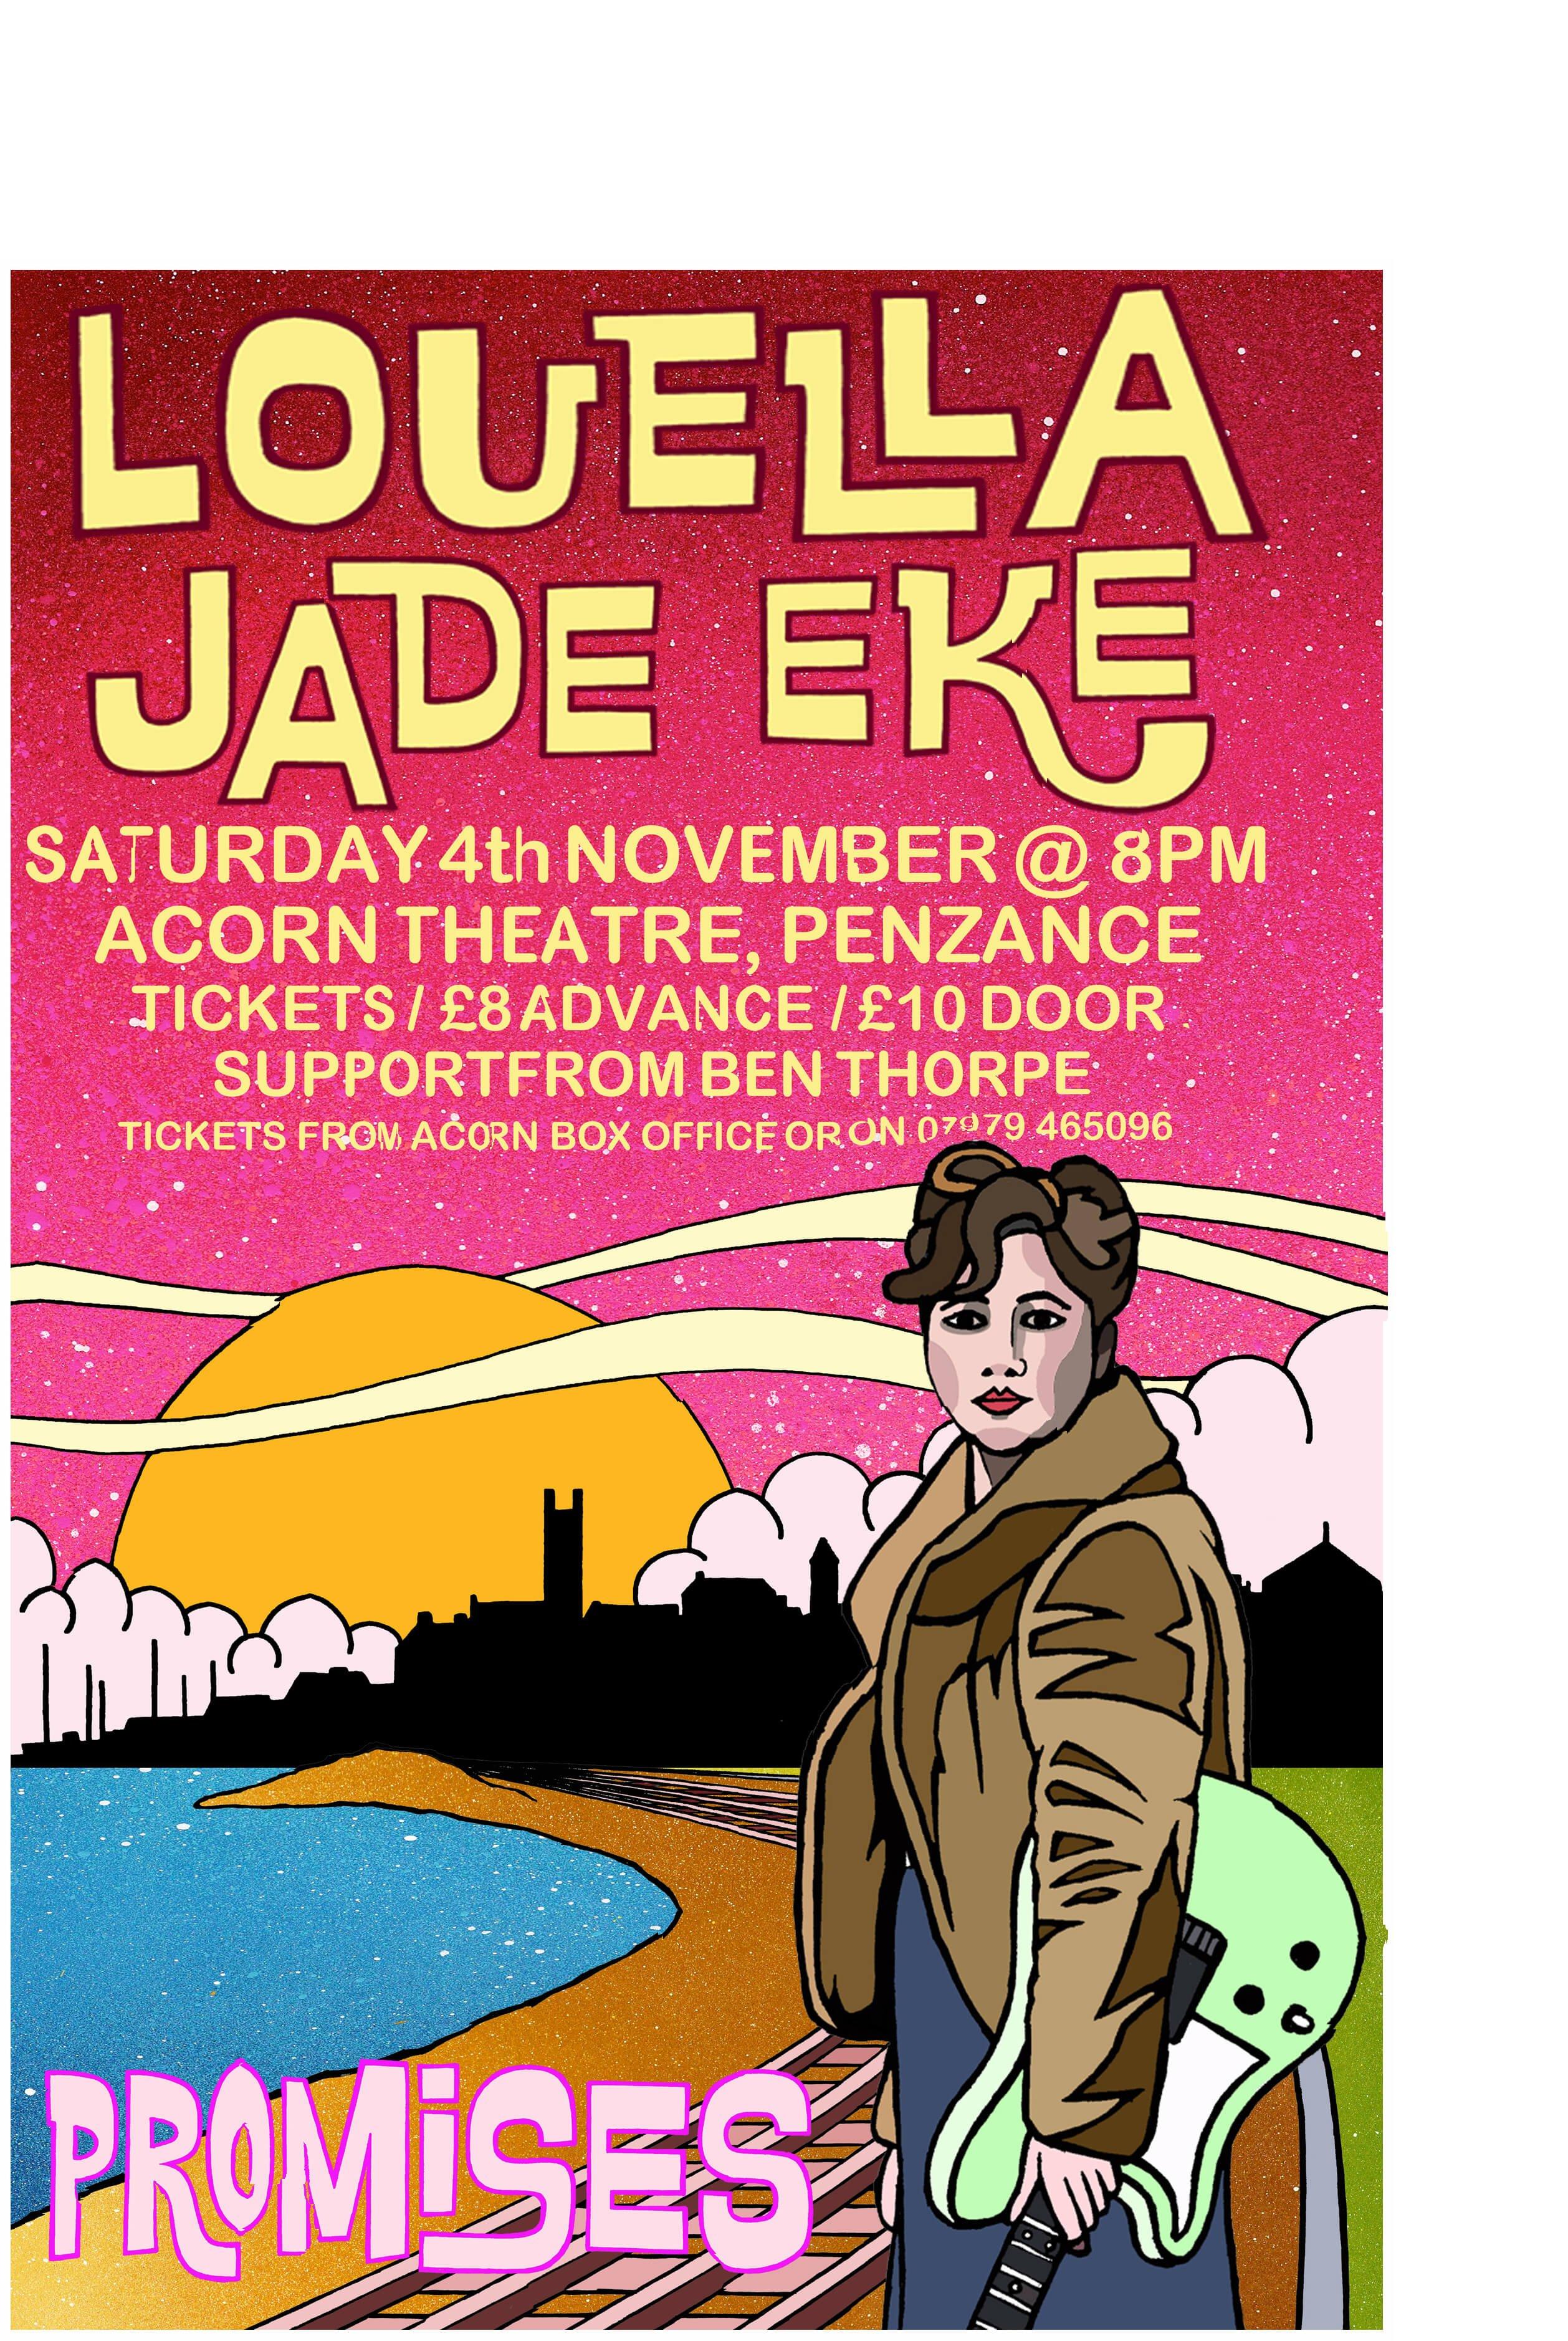 Louella Jade Eke - Promises EP Launch